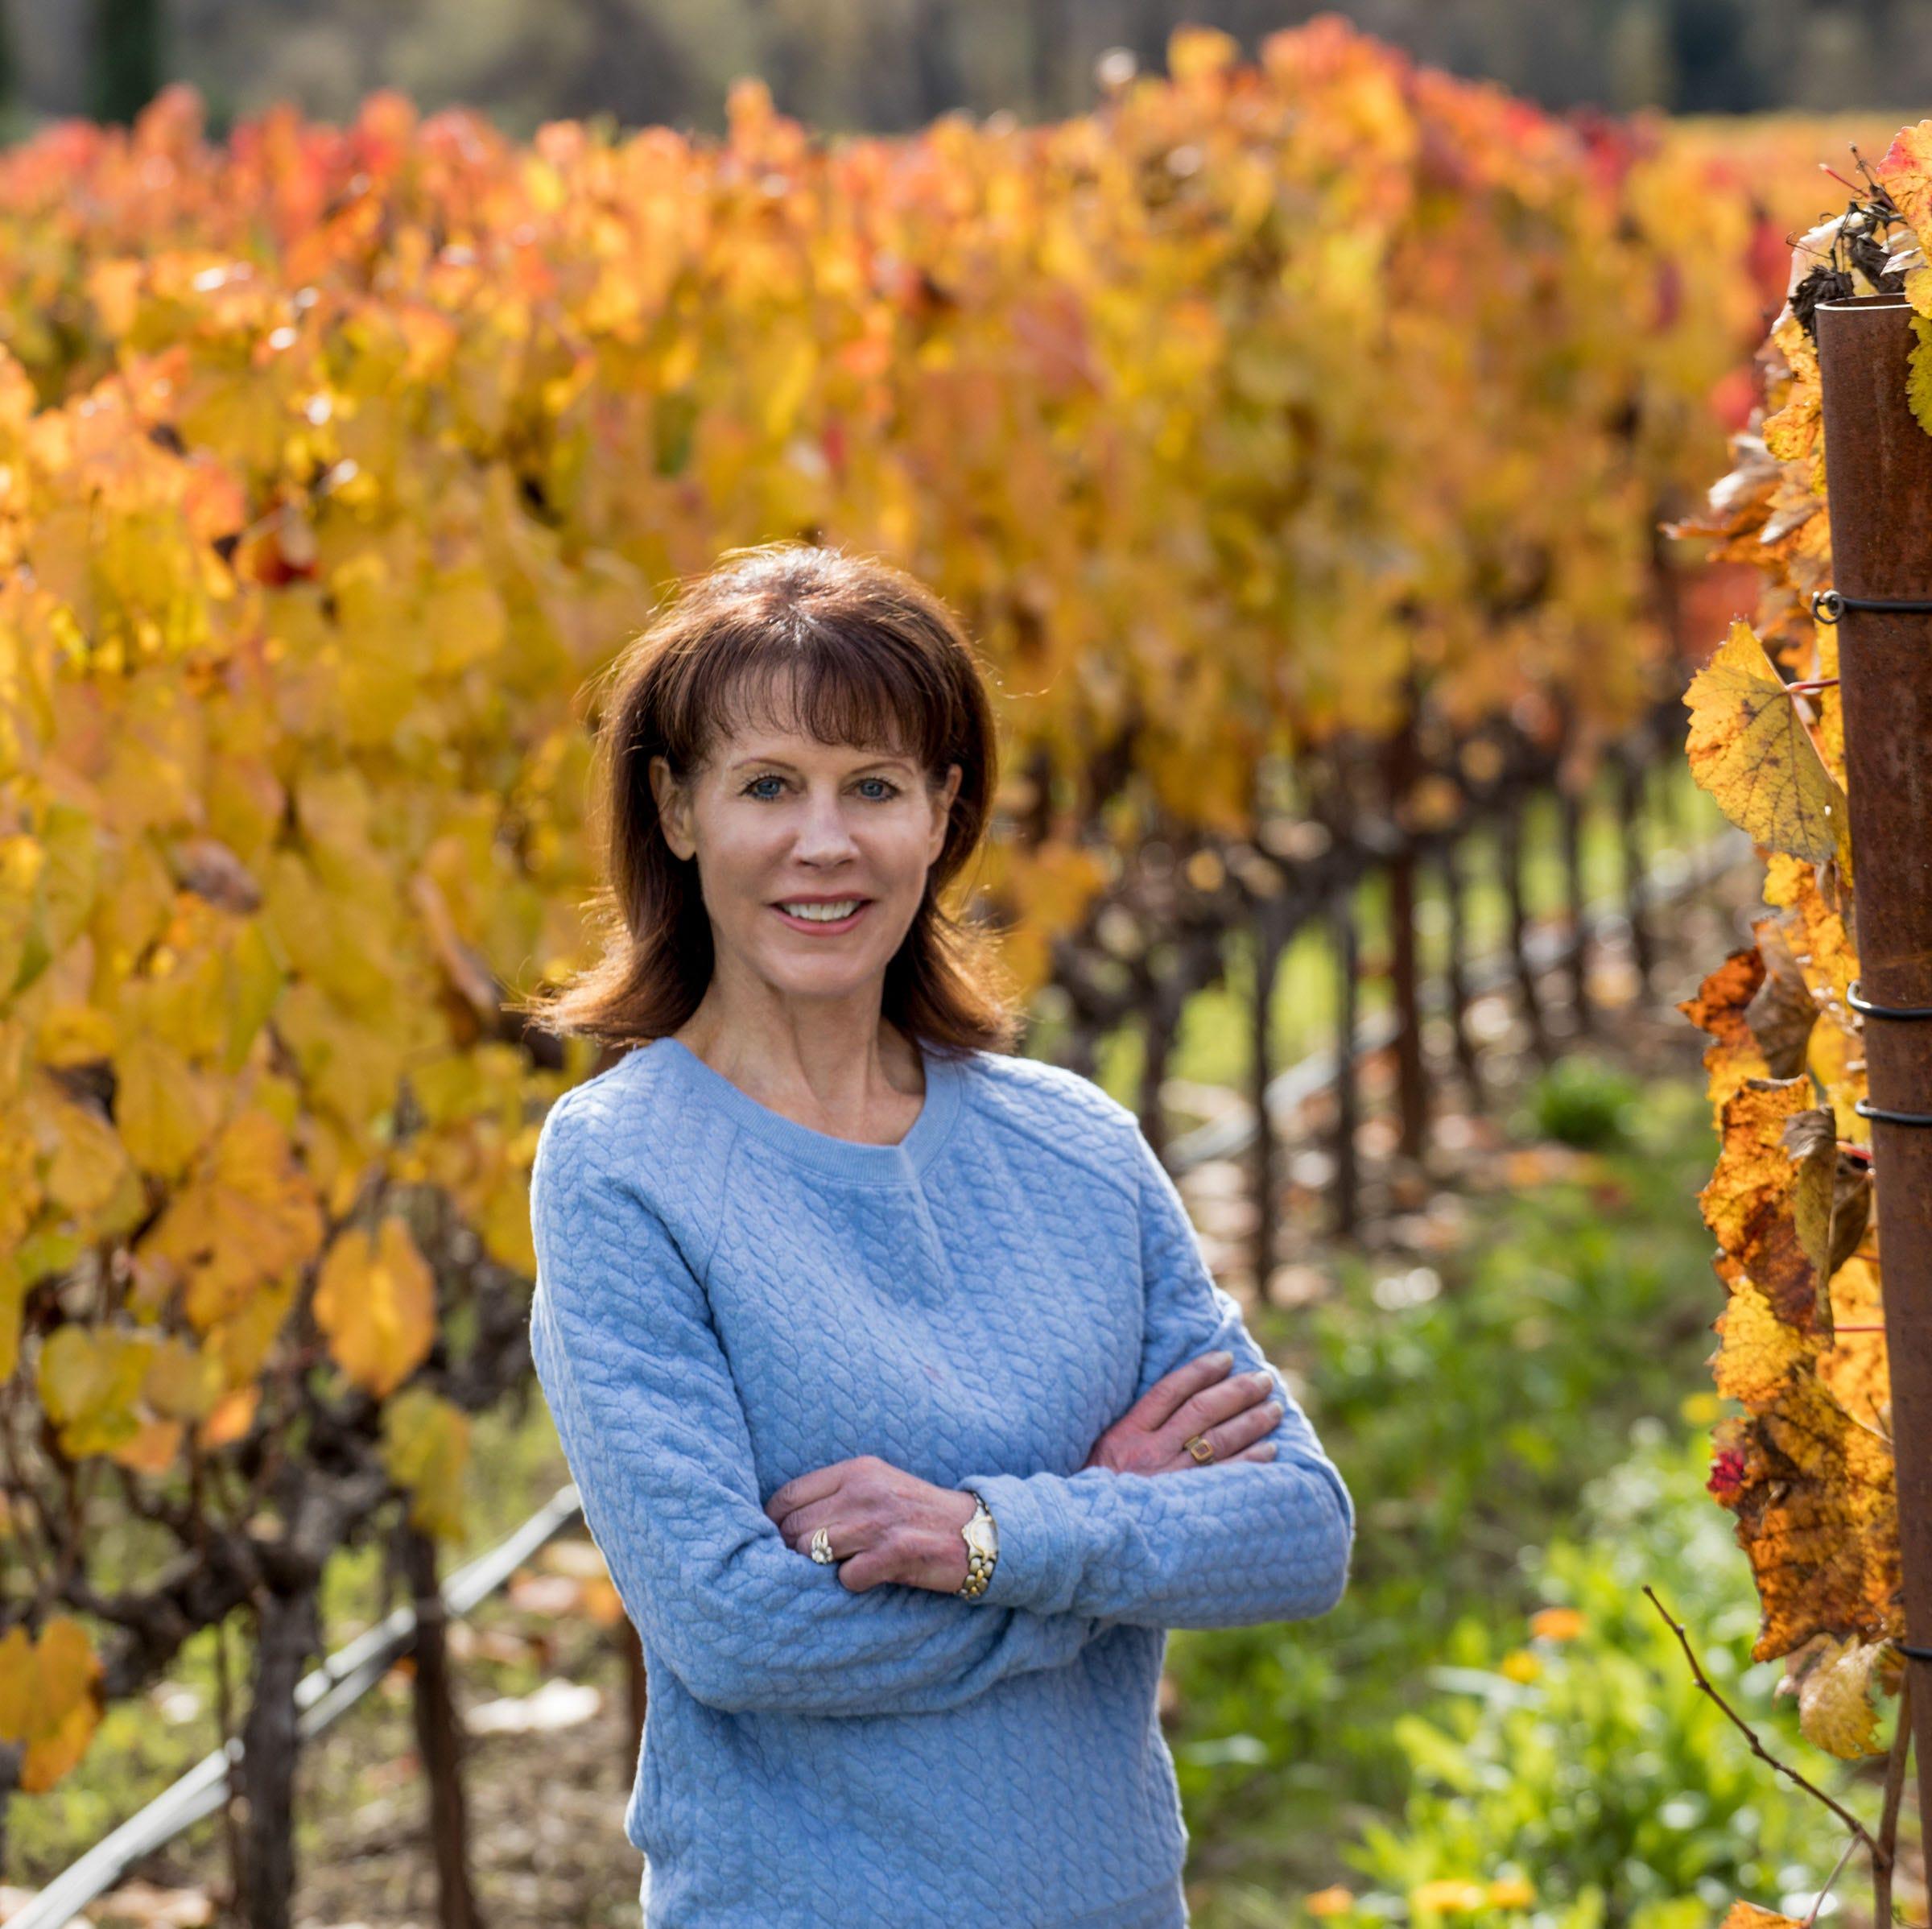 Ferrari,Carano winery hosts first Reno wine dinner in 10 years